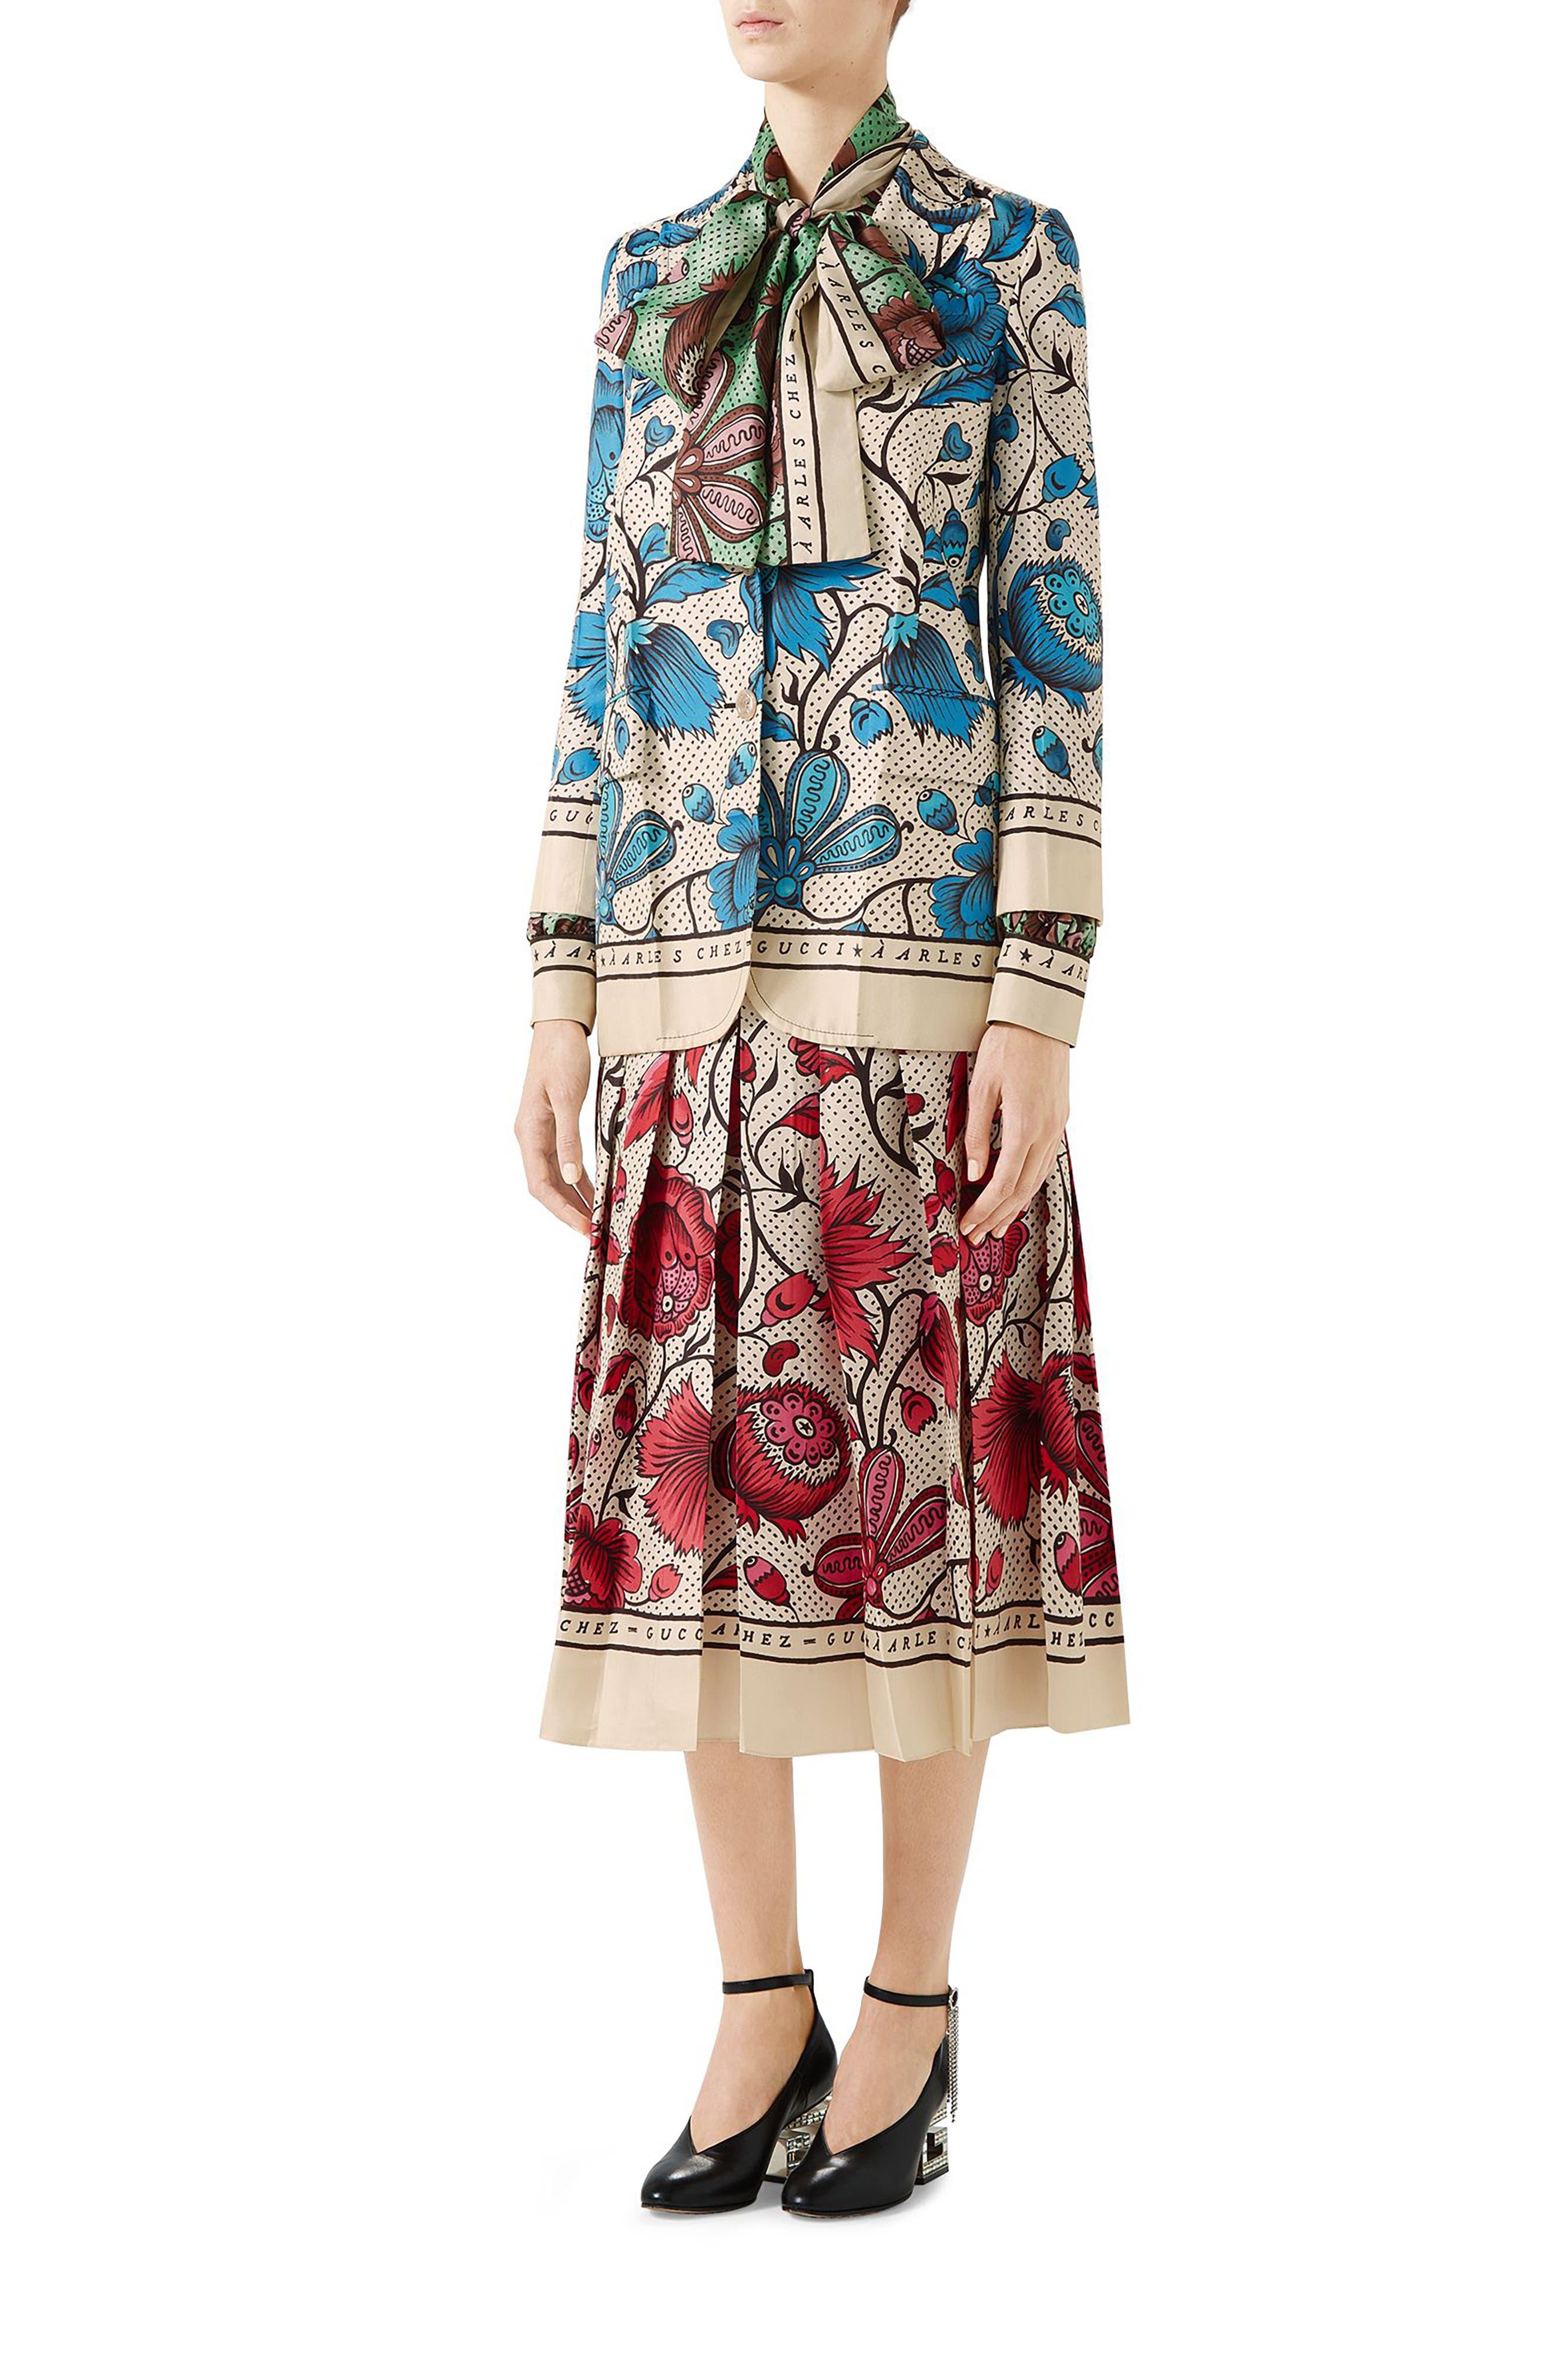 Watercolor Floral Print Pleated Silk Twill Midi Skirt,                             Alternate thumbnail 3, color,                             5349 FUCHSIA/ IVORY PRINTE